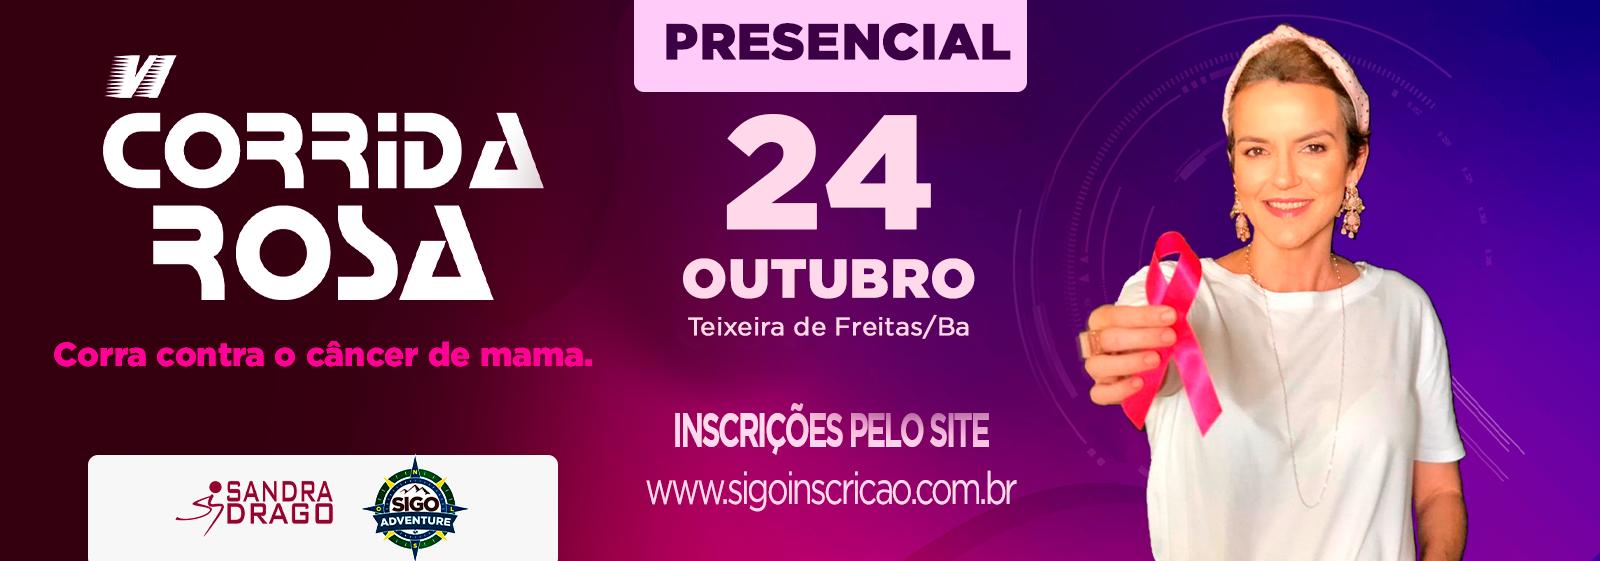 Banner Rosa - MI Presencial